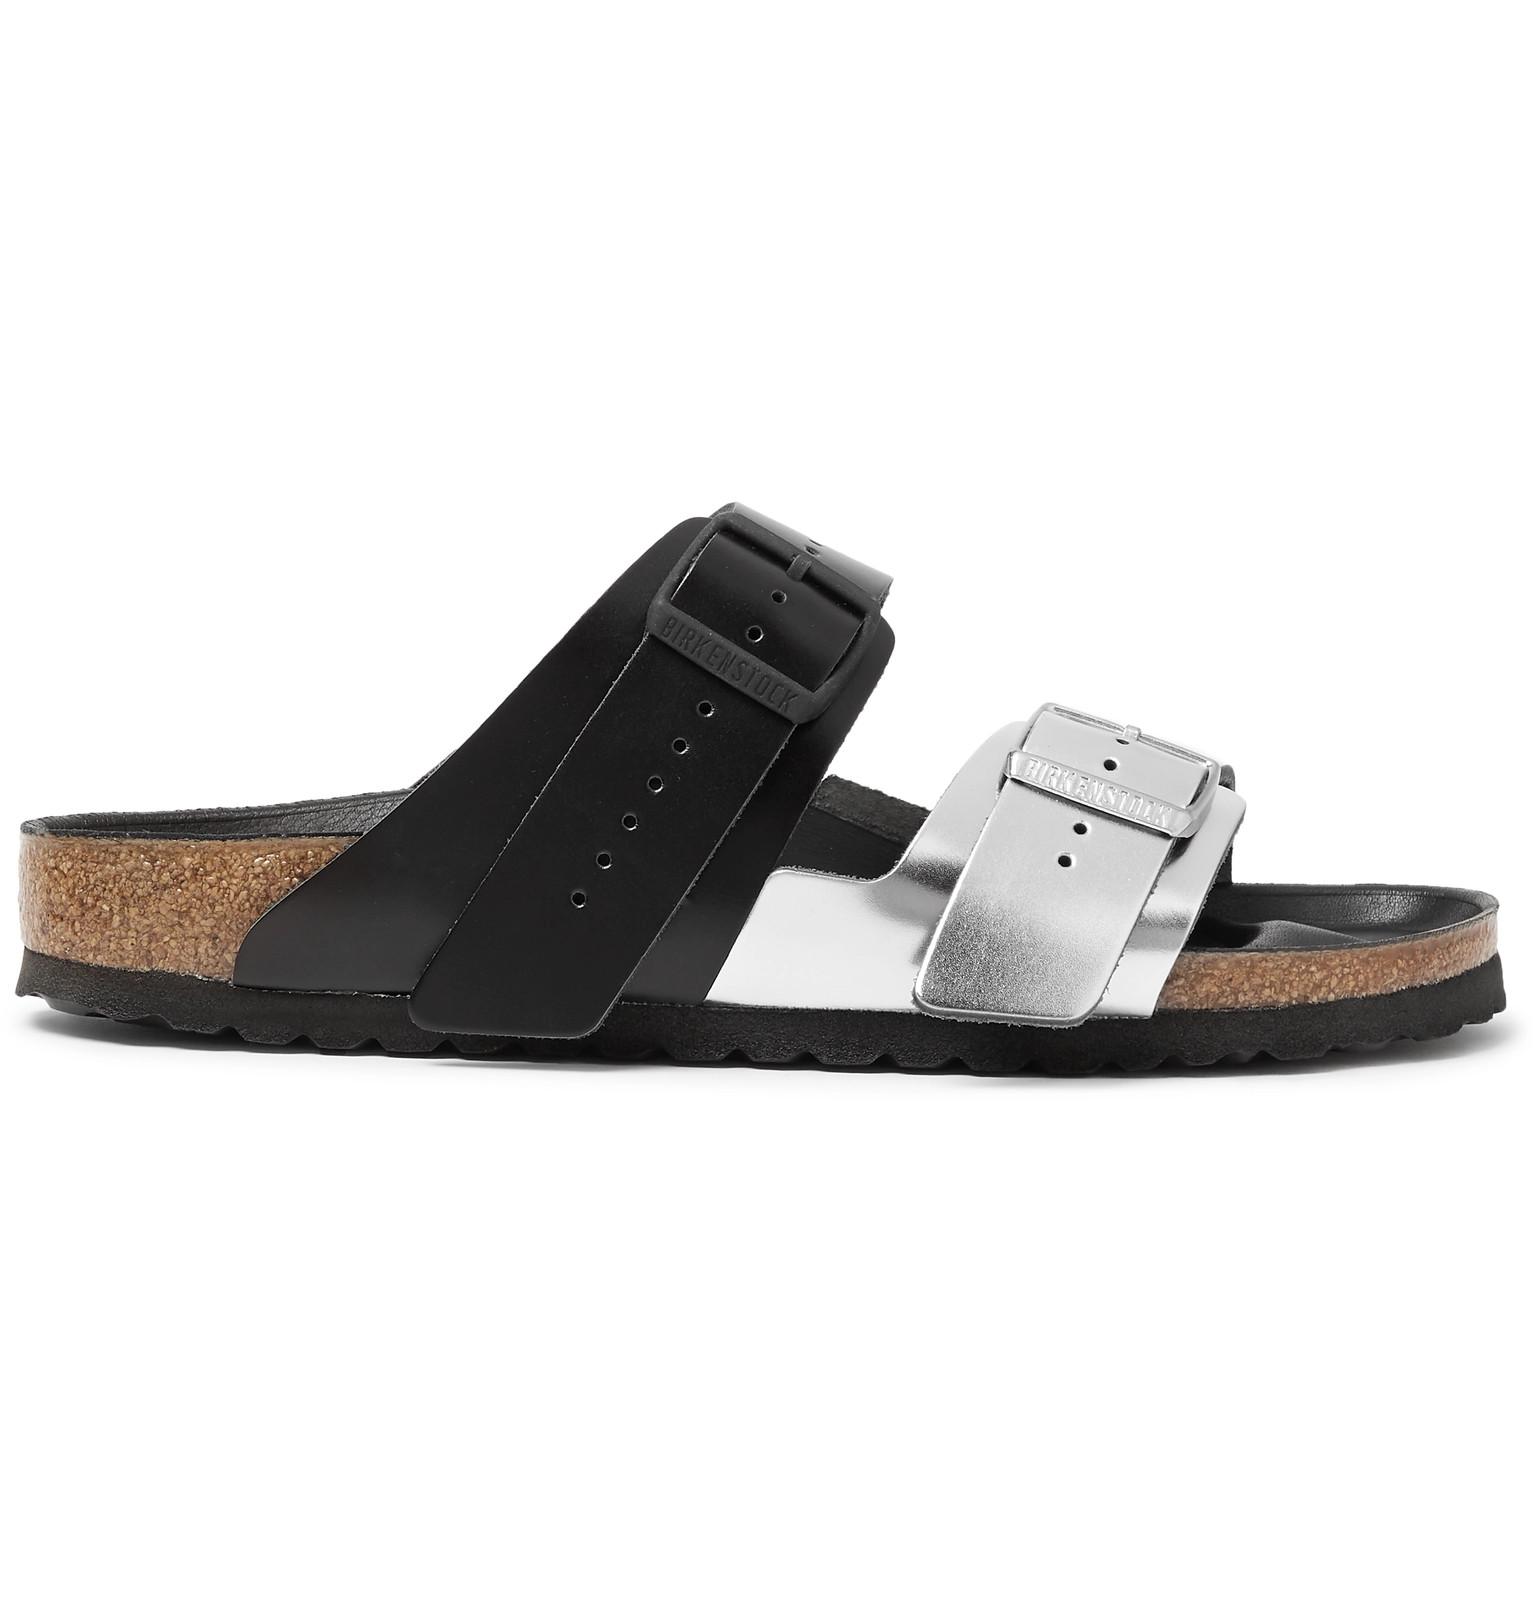 e76999c601f0 Rick Owens - + Birkenstock Arizona Two-Tone Leather Sandals